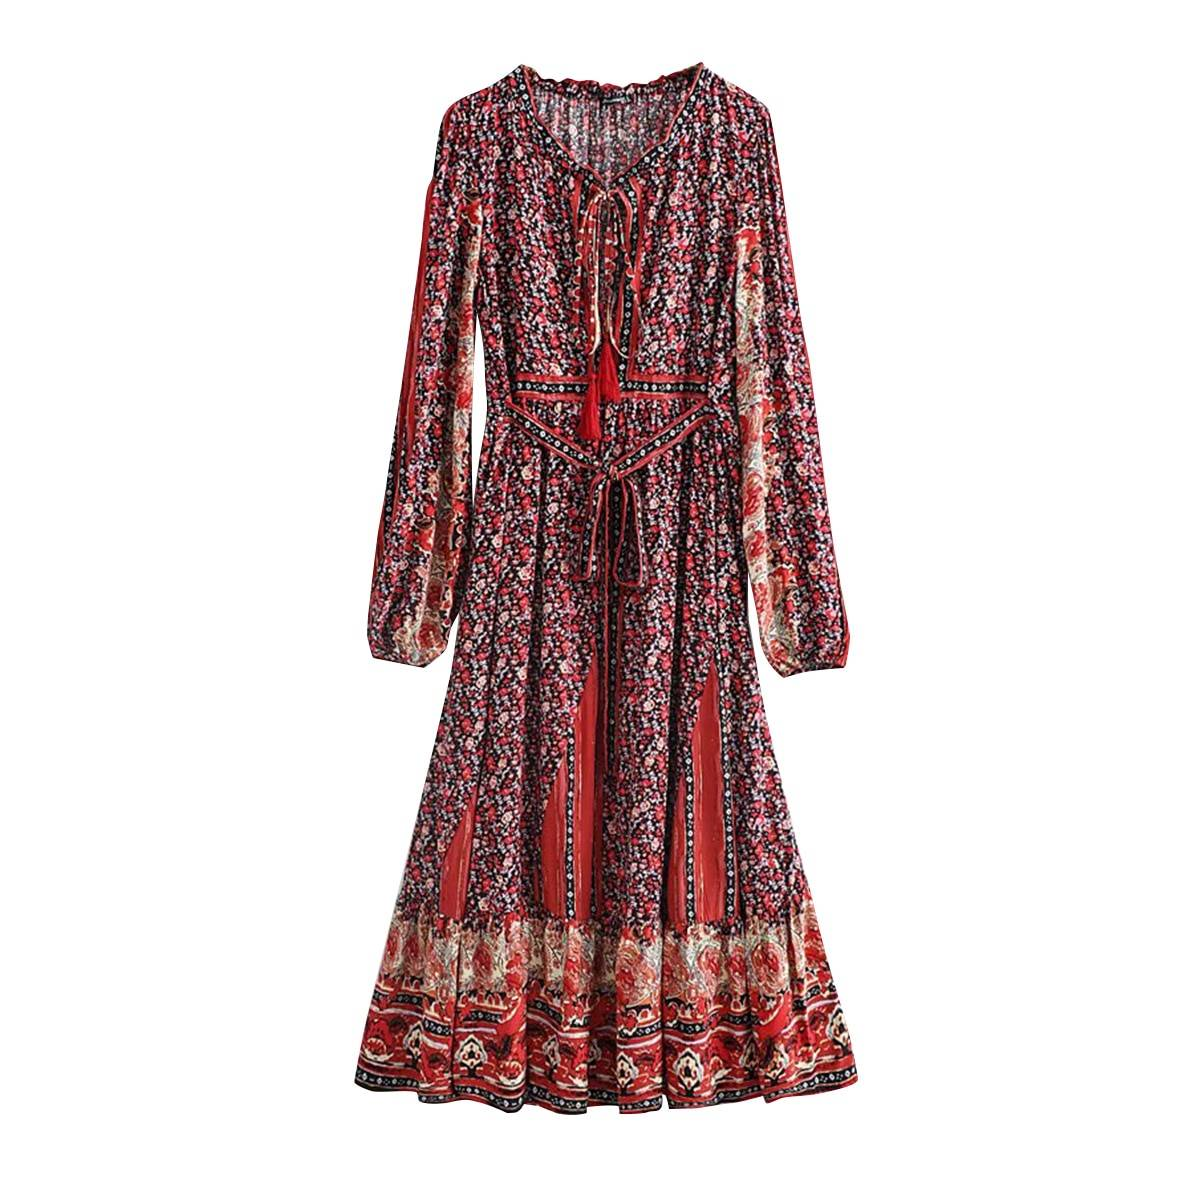 Long sleeve cotton floral print loose casual maxi dress